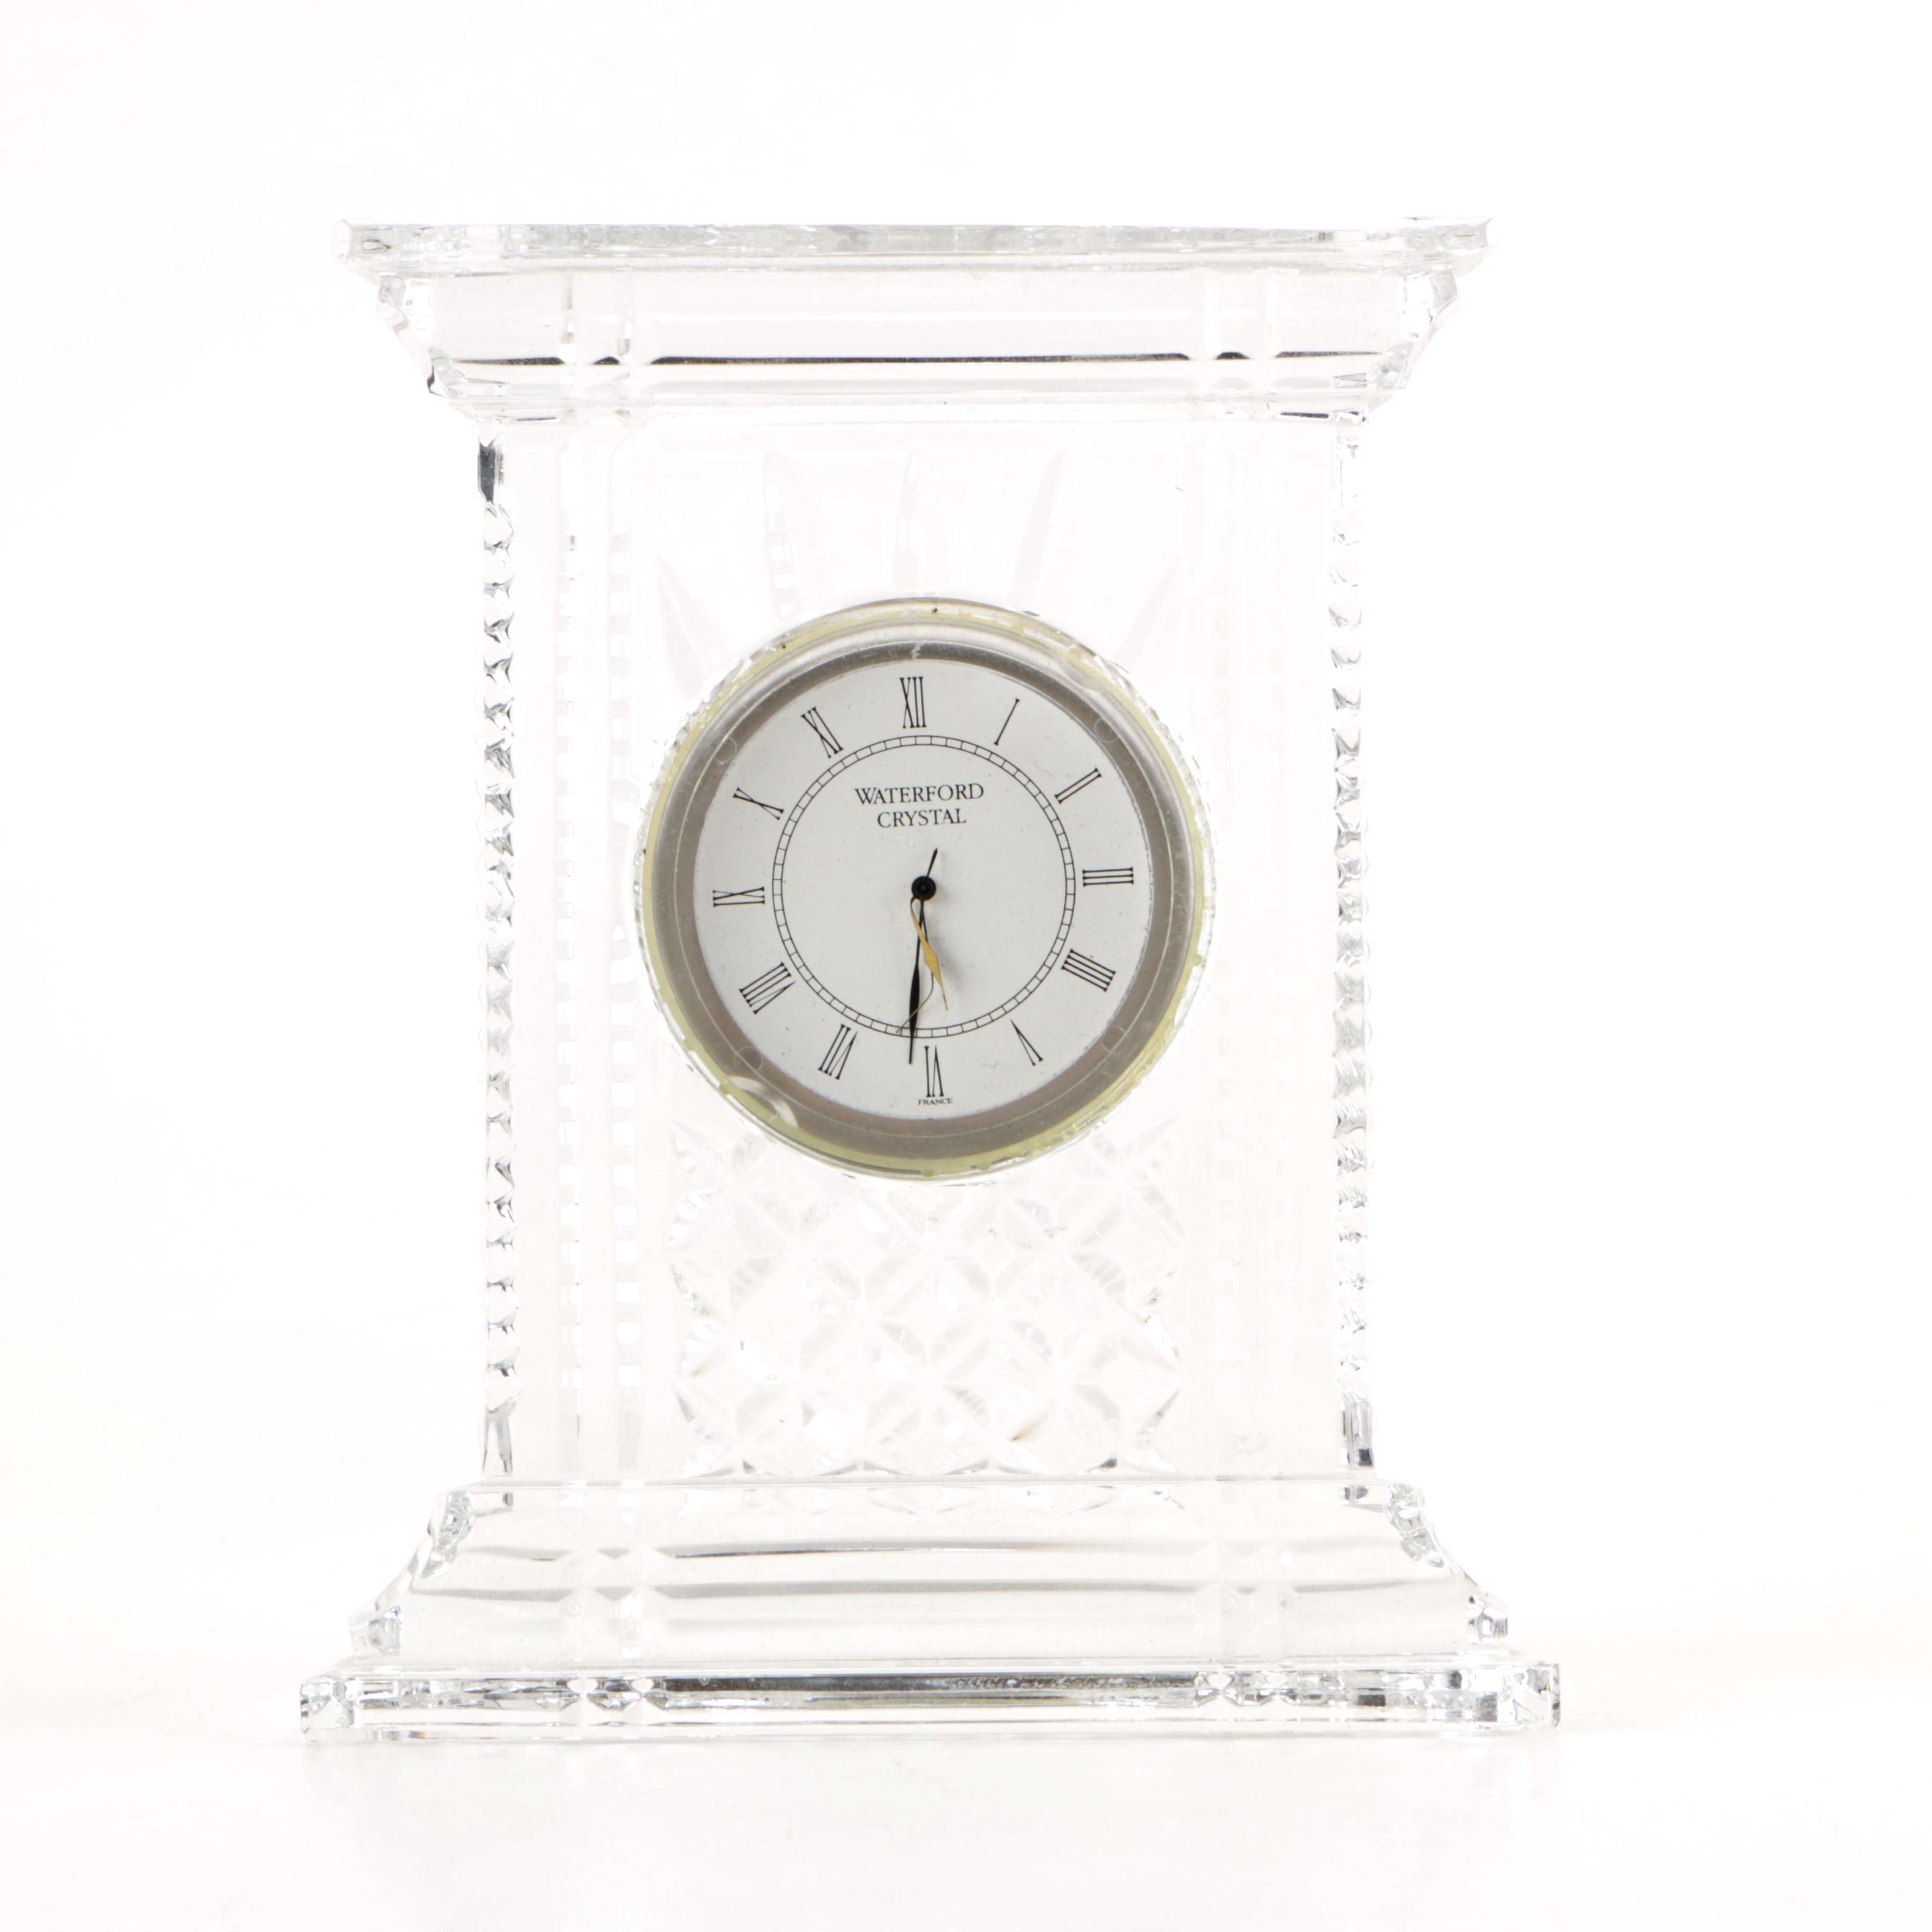 Waterford Crystal Mantel Clock